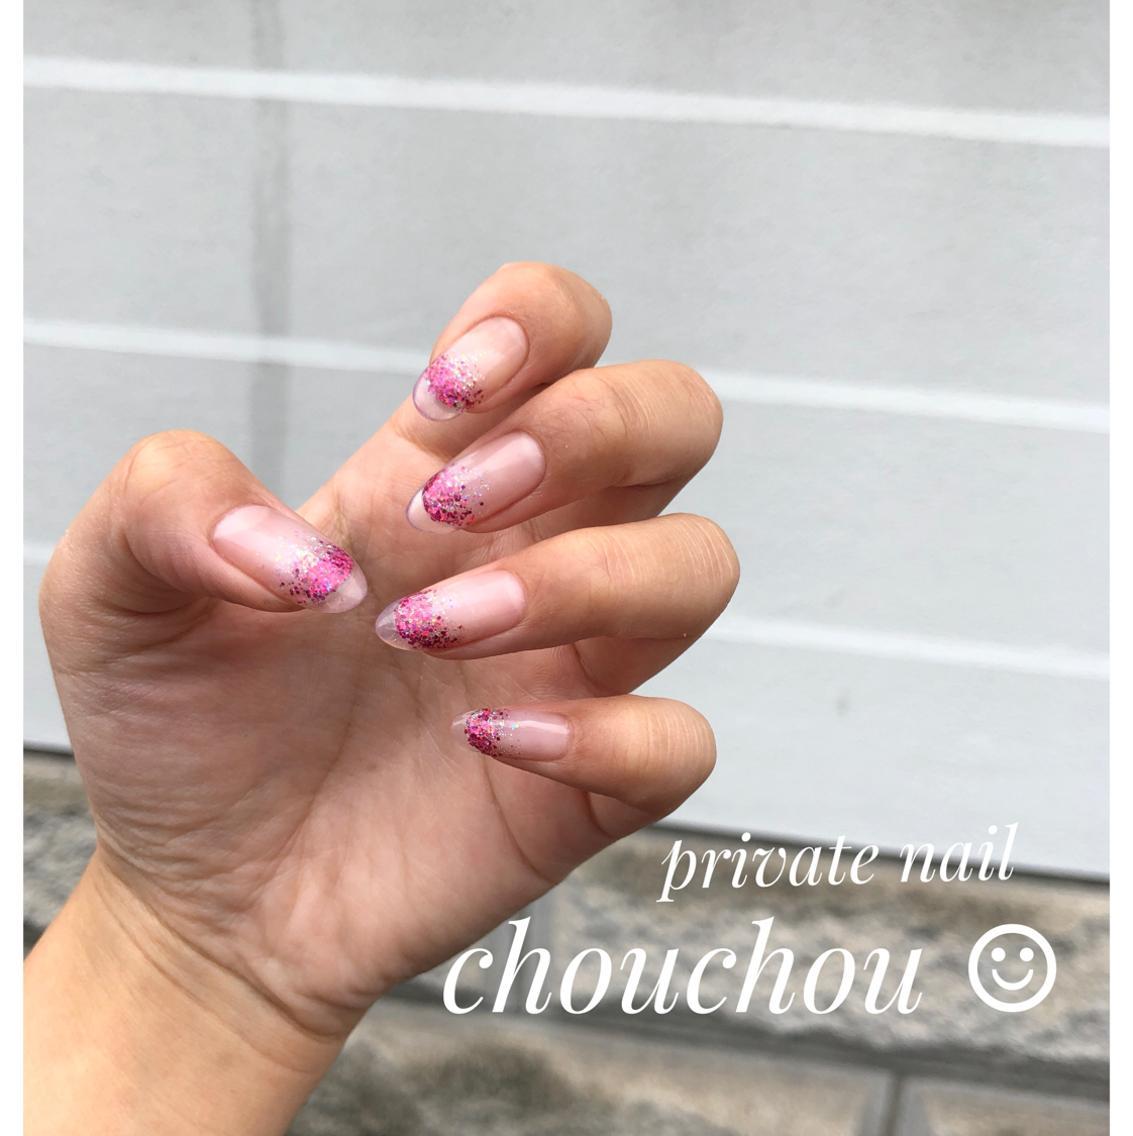 private nail  chouchou  (シュシュ)所属・松下 史佳の掲載